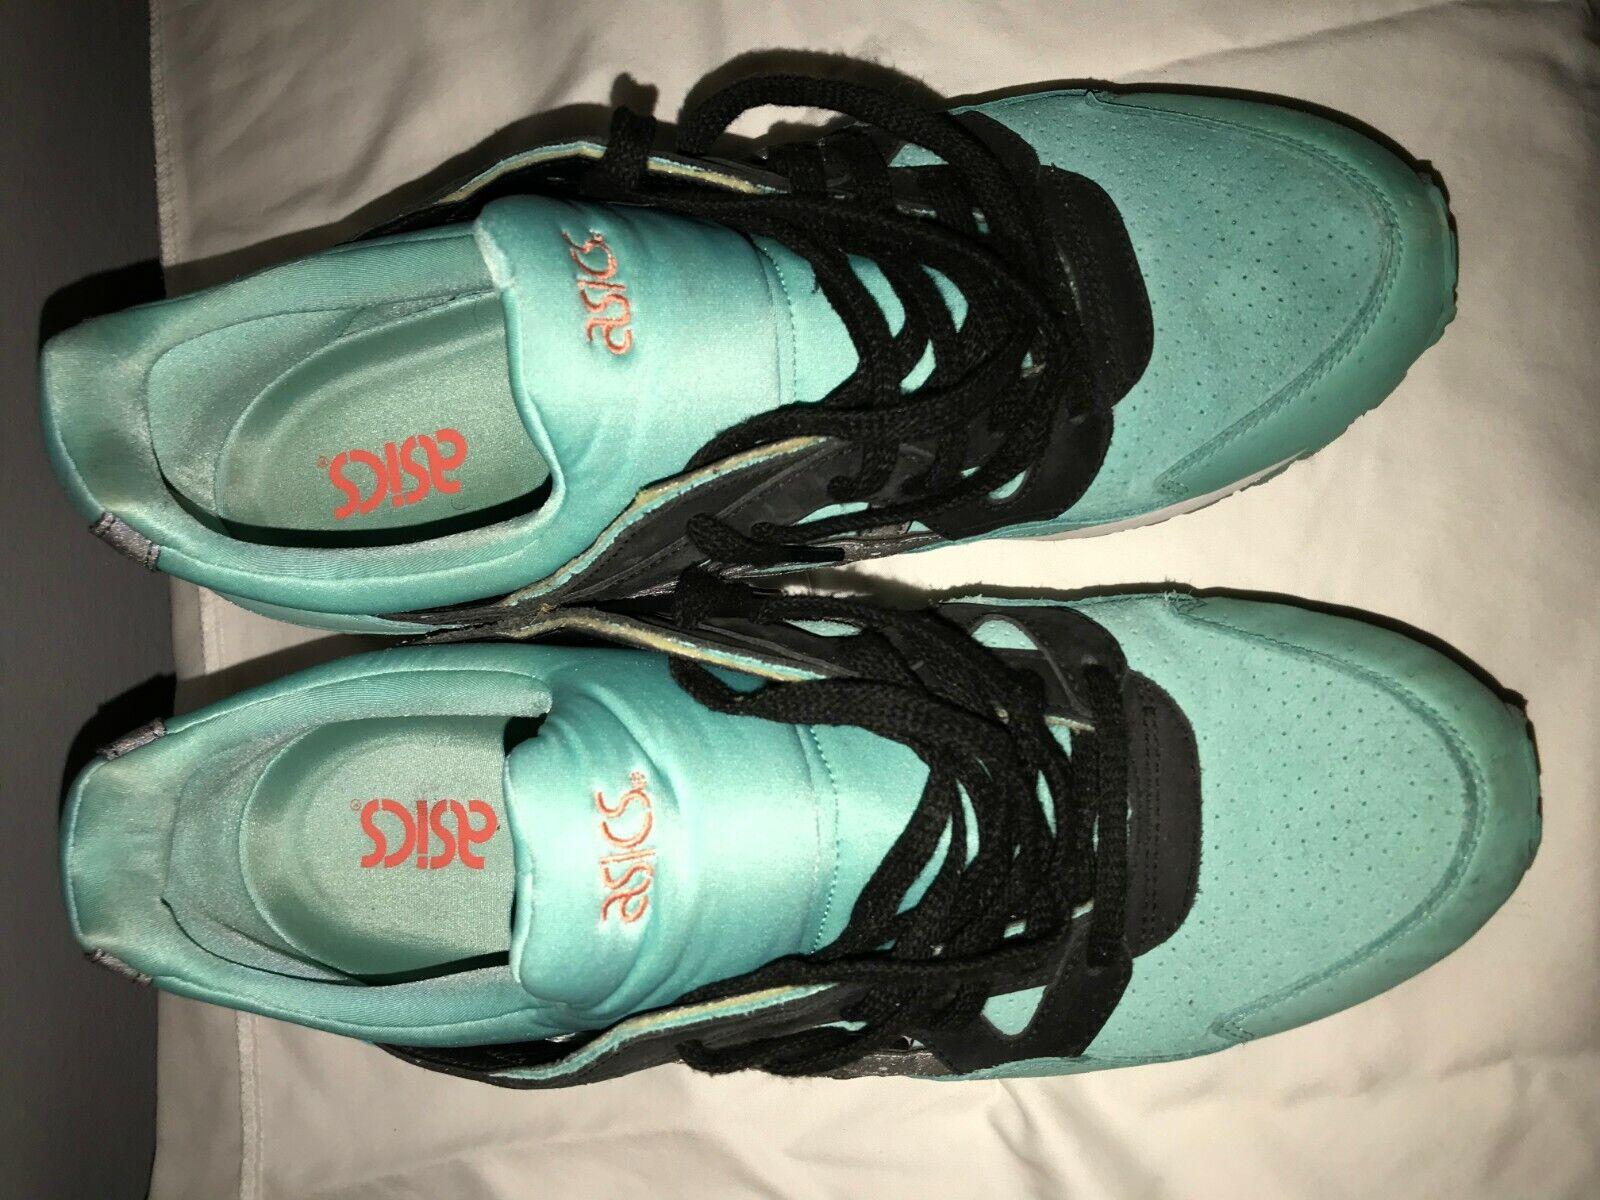 Classic Asics Gel Lyte V Size 13 H607N 7790 Miami Pack Turquoise Black